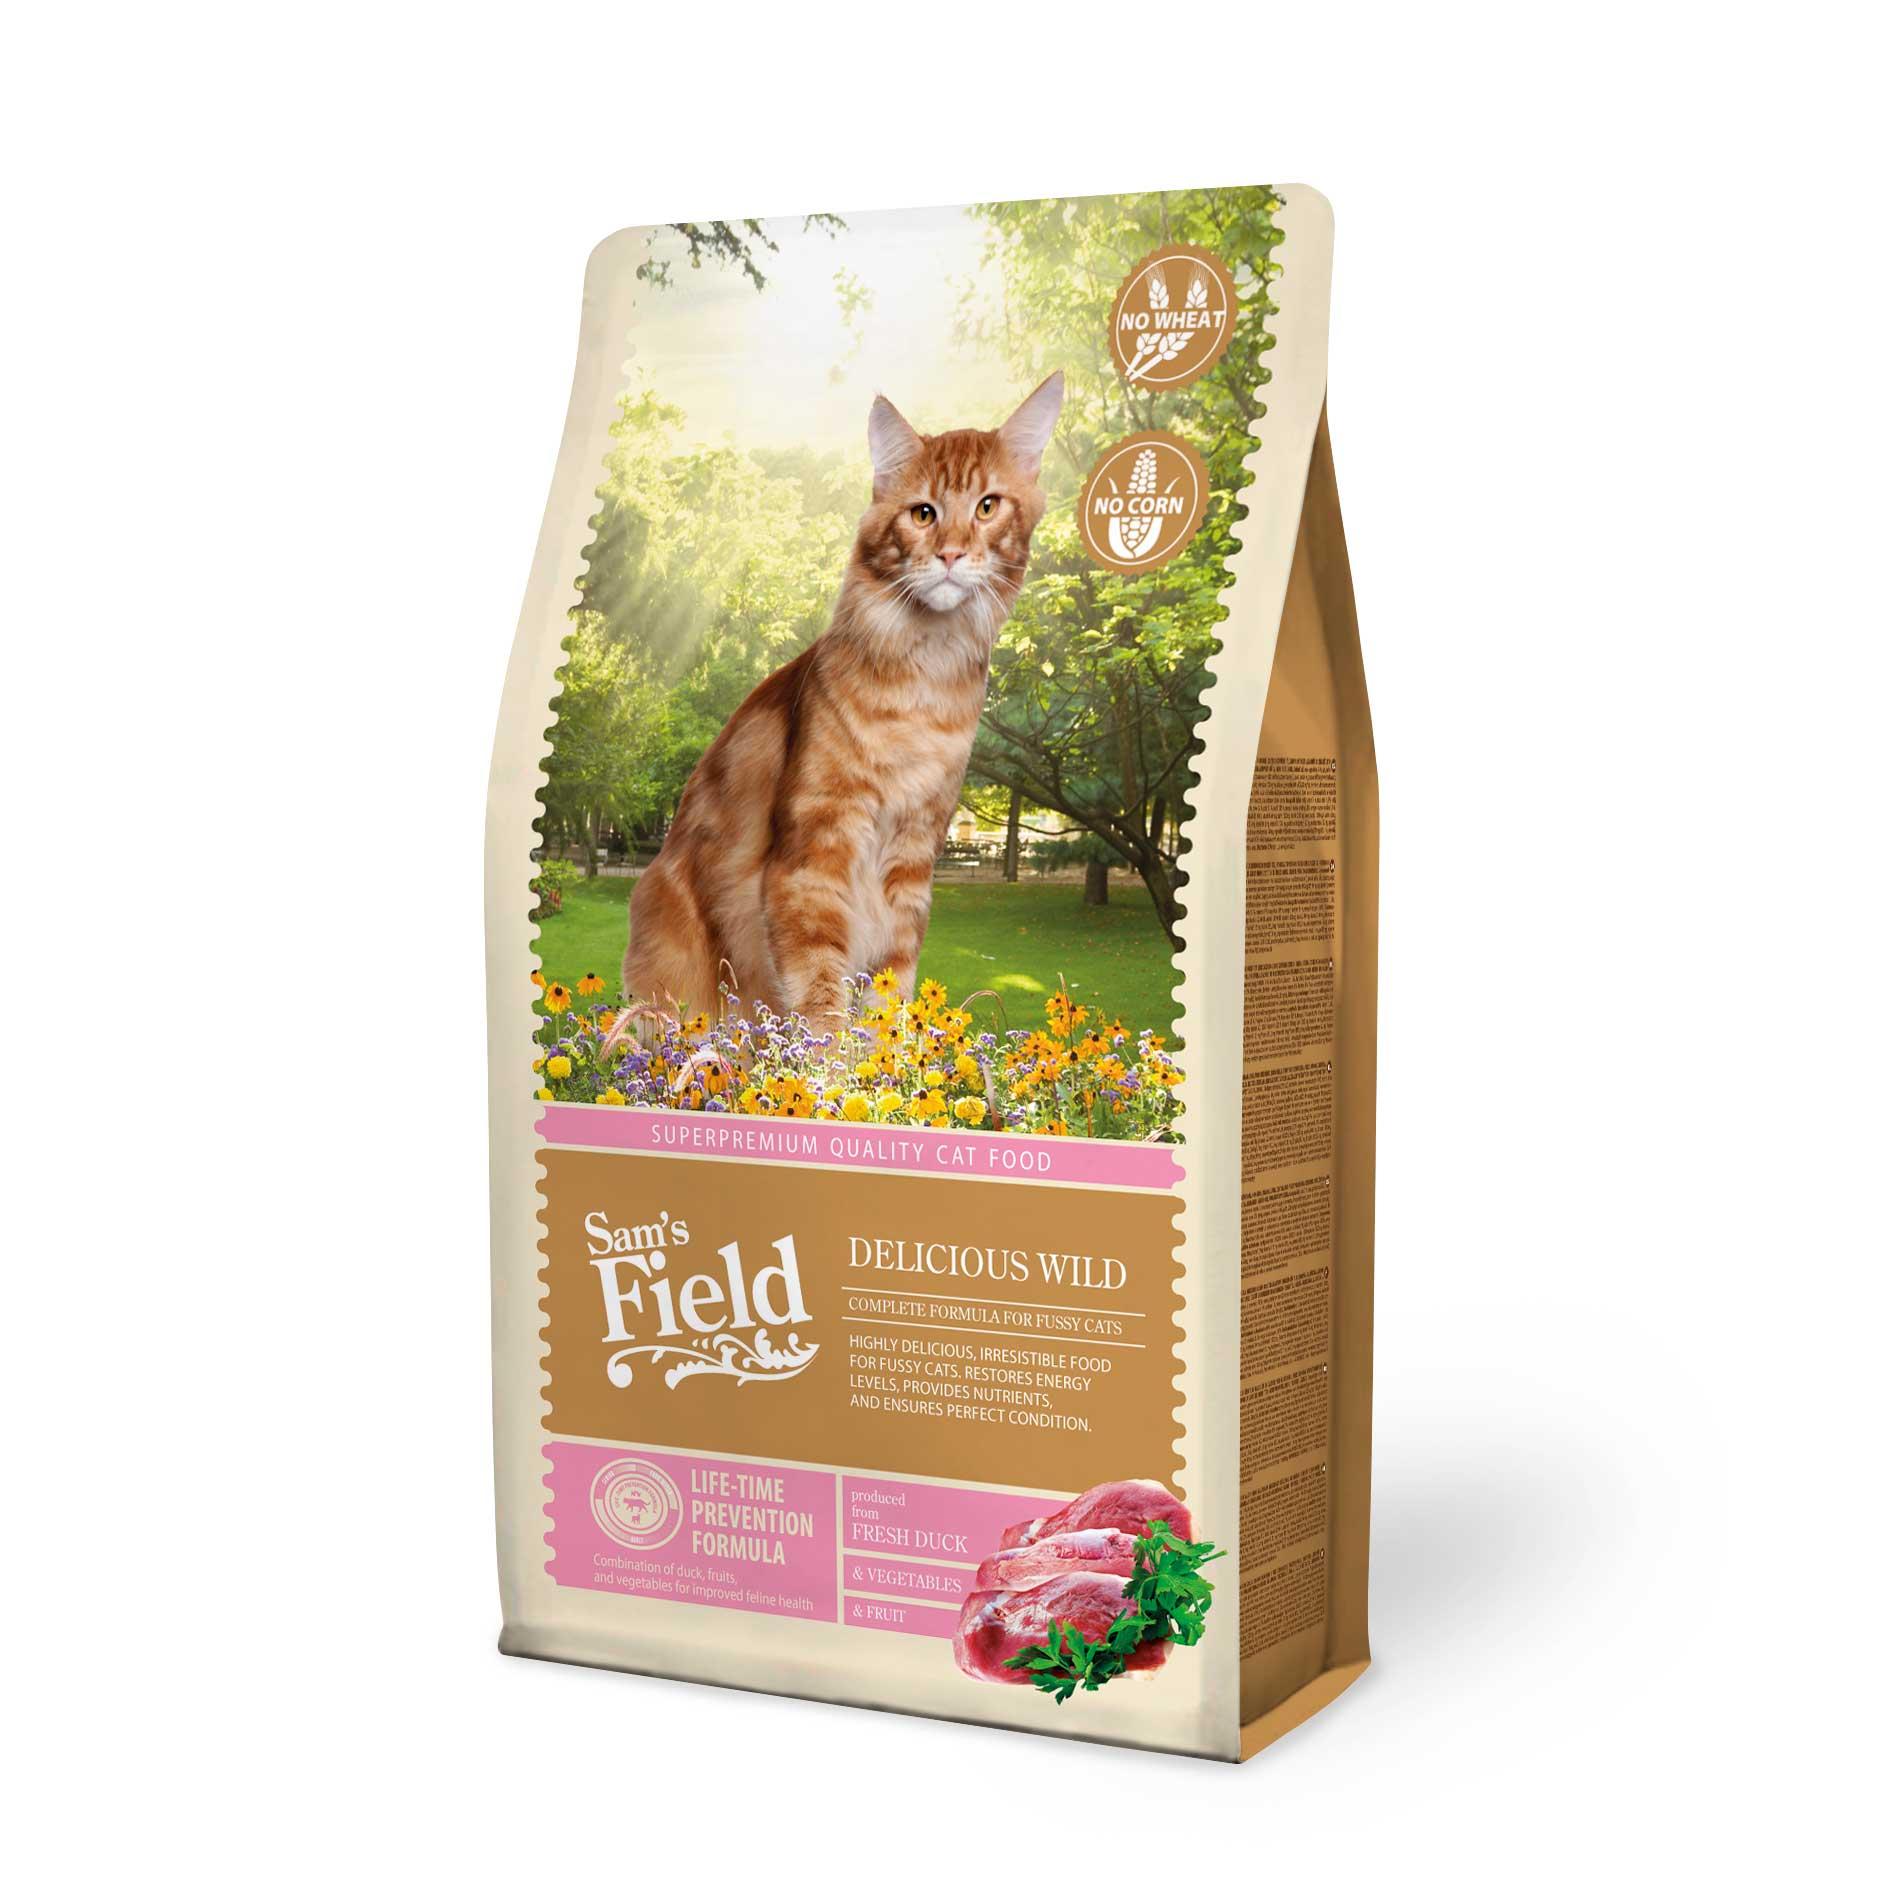 Sam's Field Kattenvoeding Delicious Wild